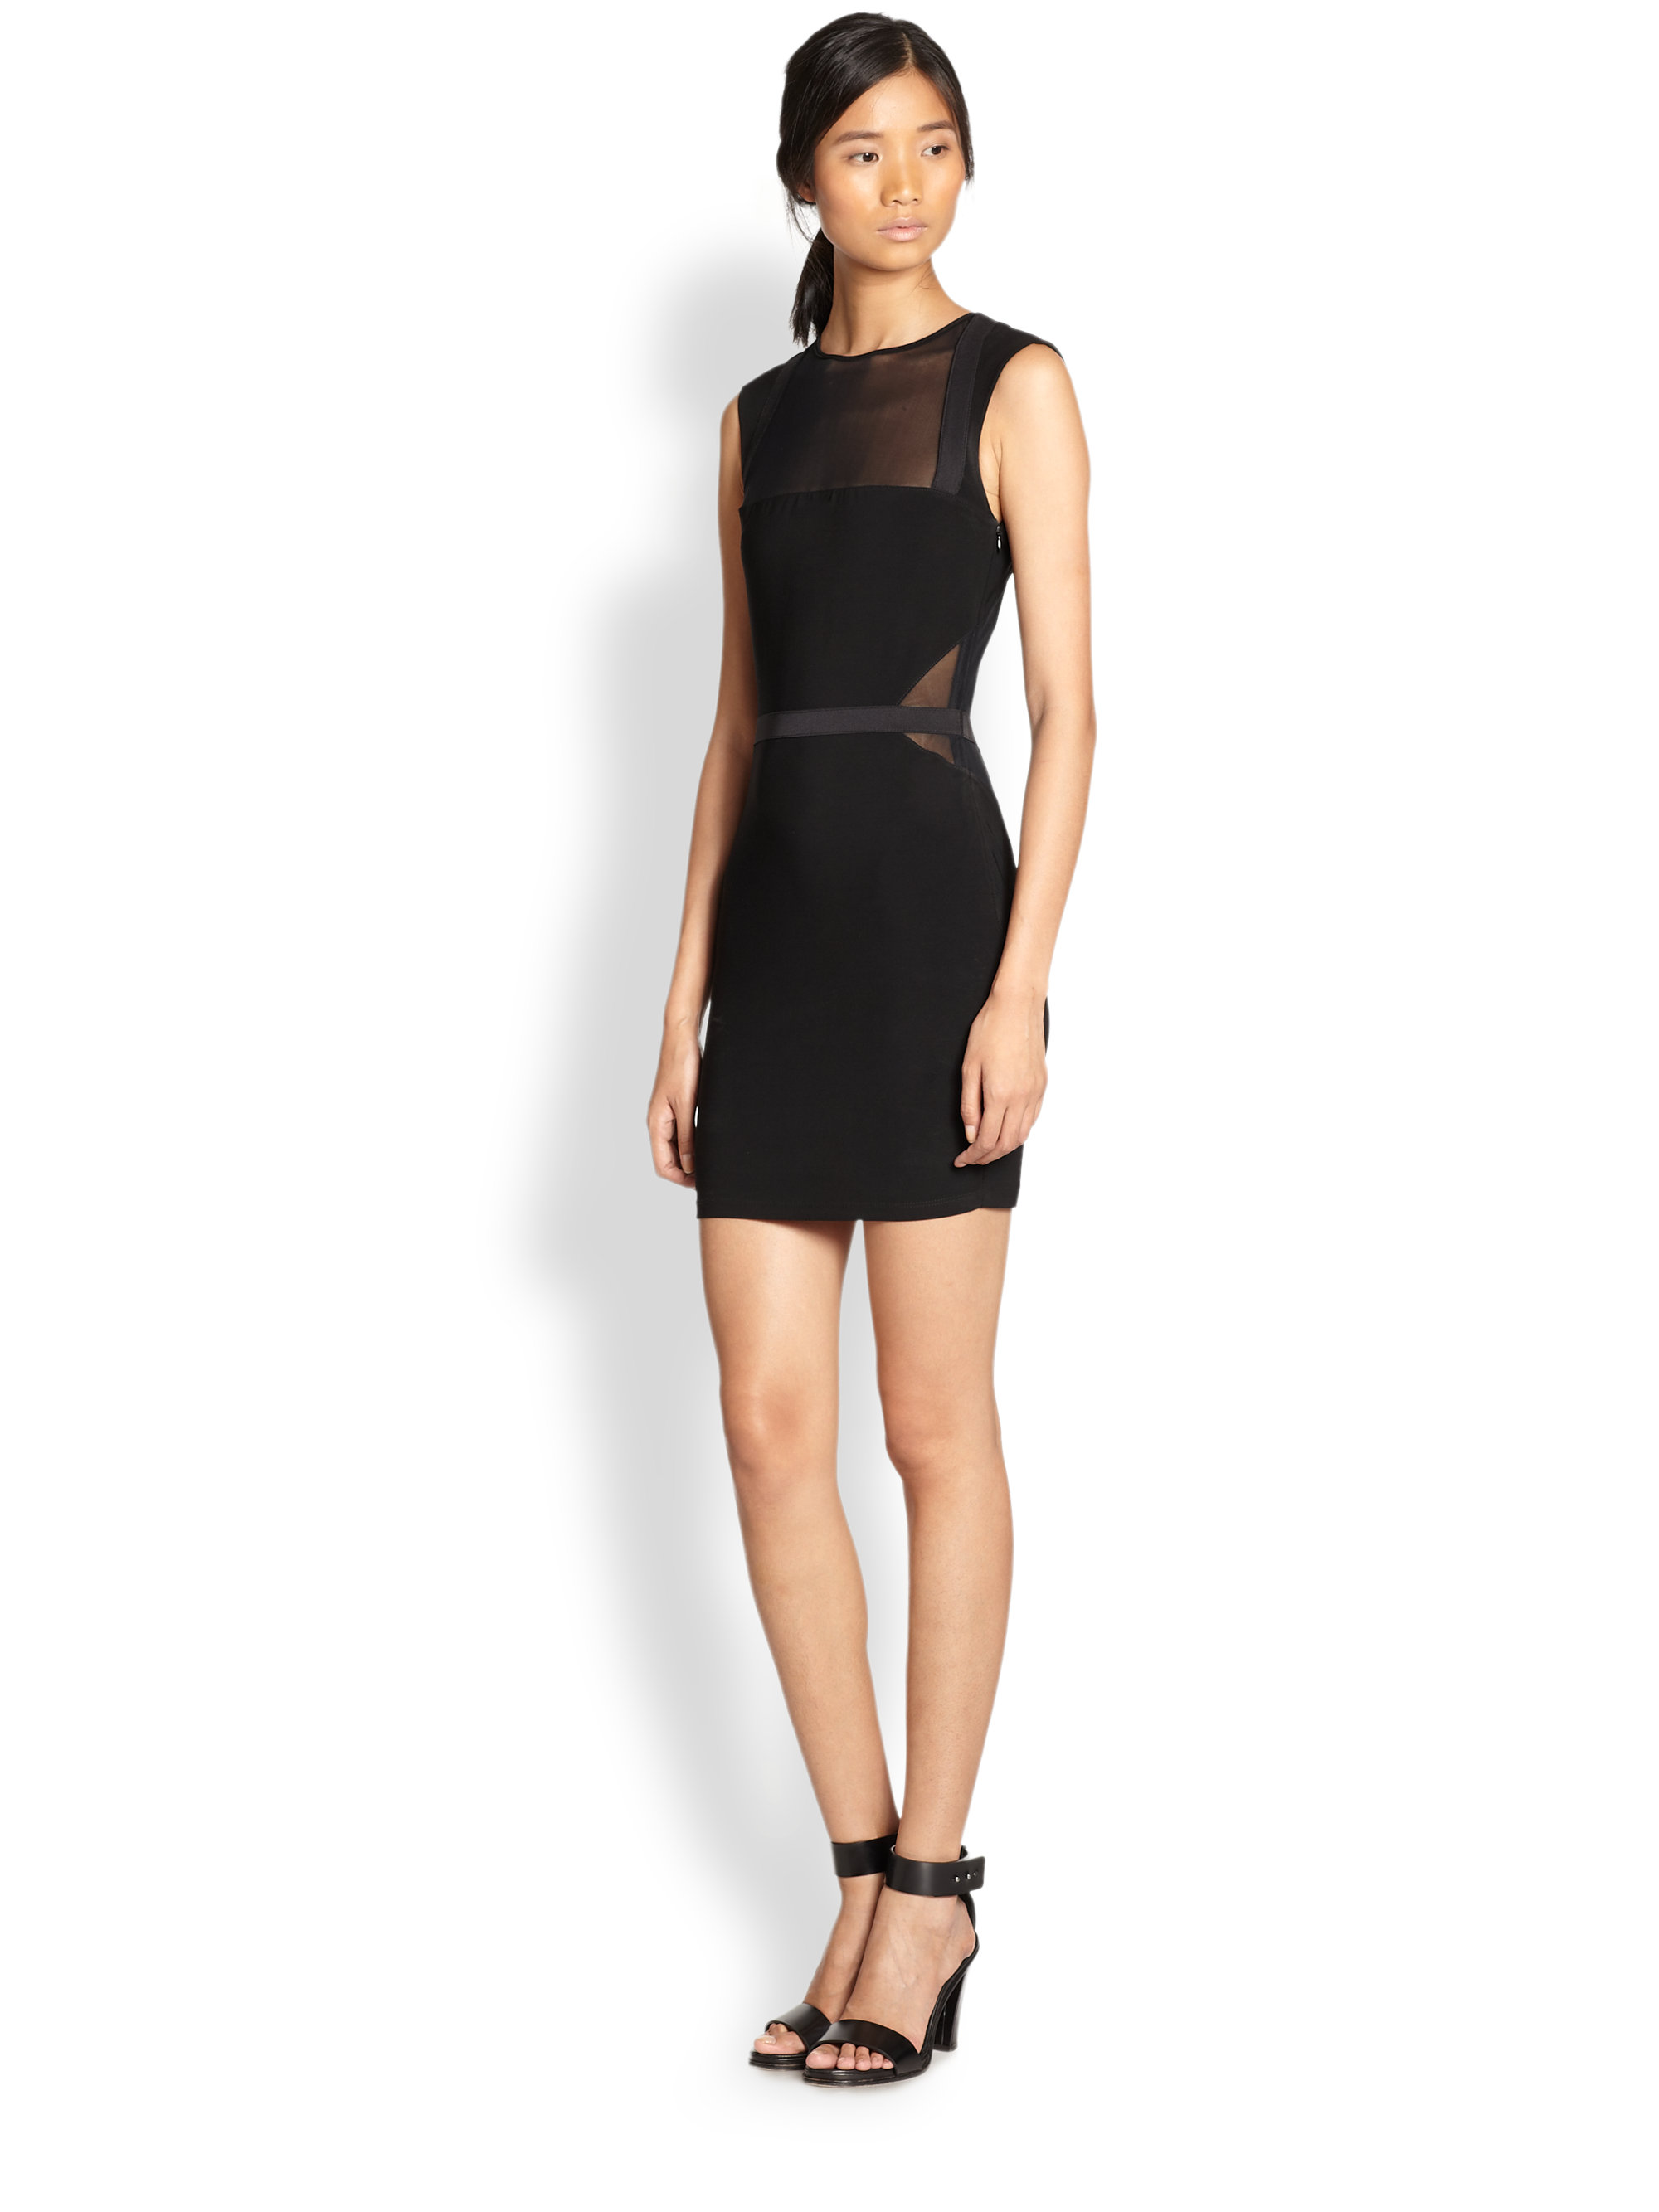 Elizabeth andjames sheer black dress